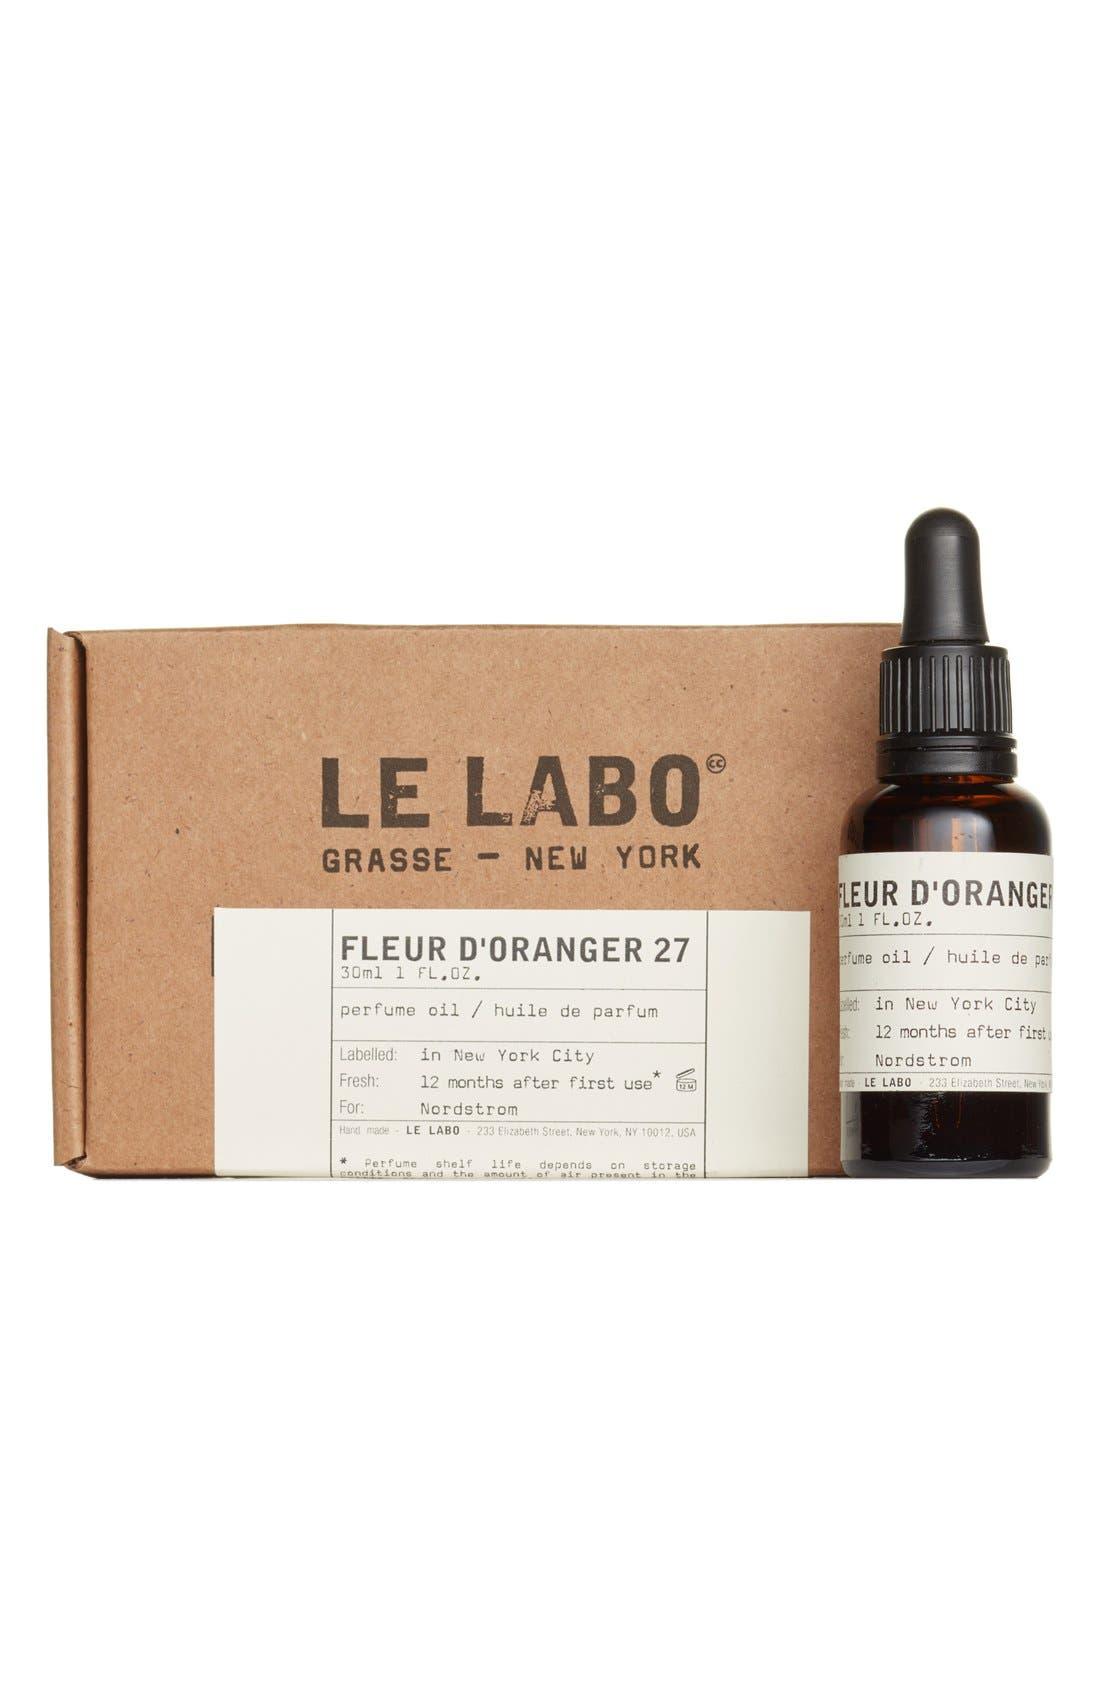 Le Labo Fleur D Oranger 27 Perfume Oil Nordstrom